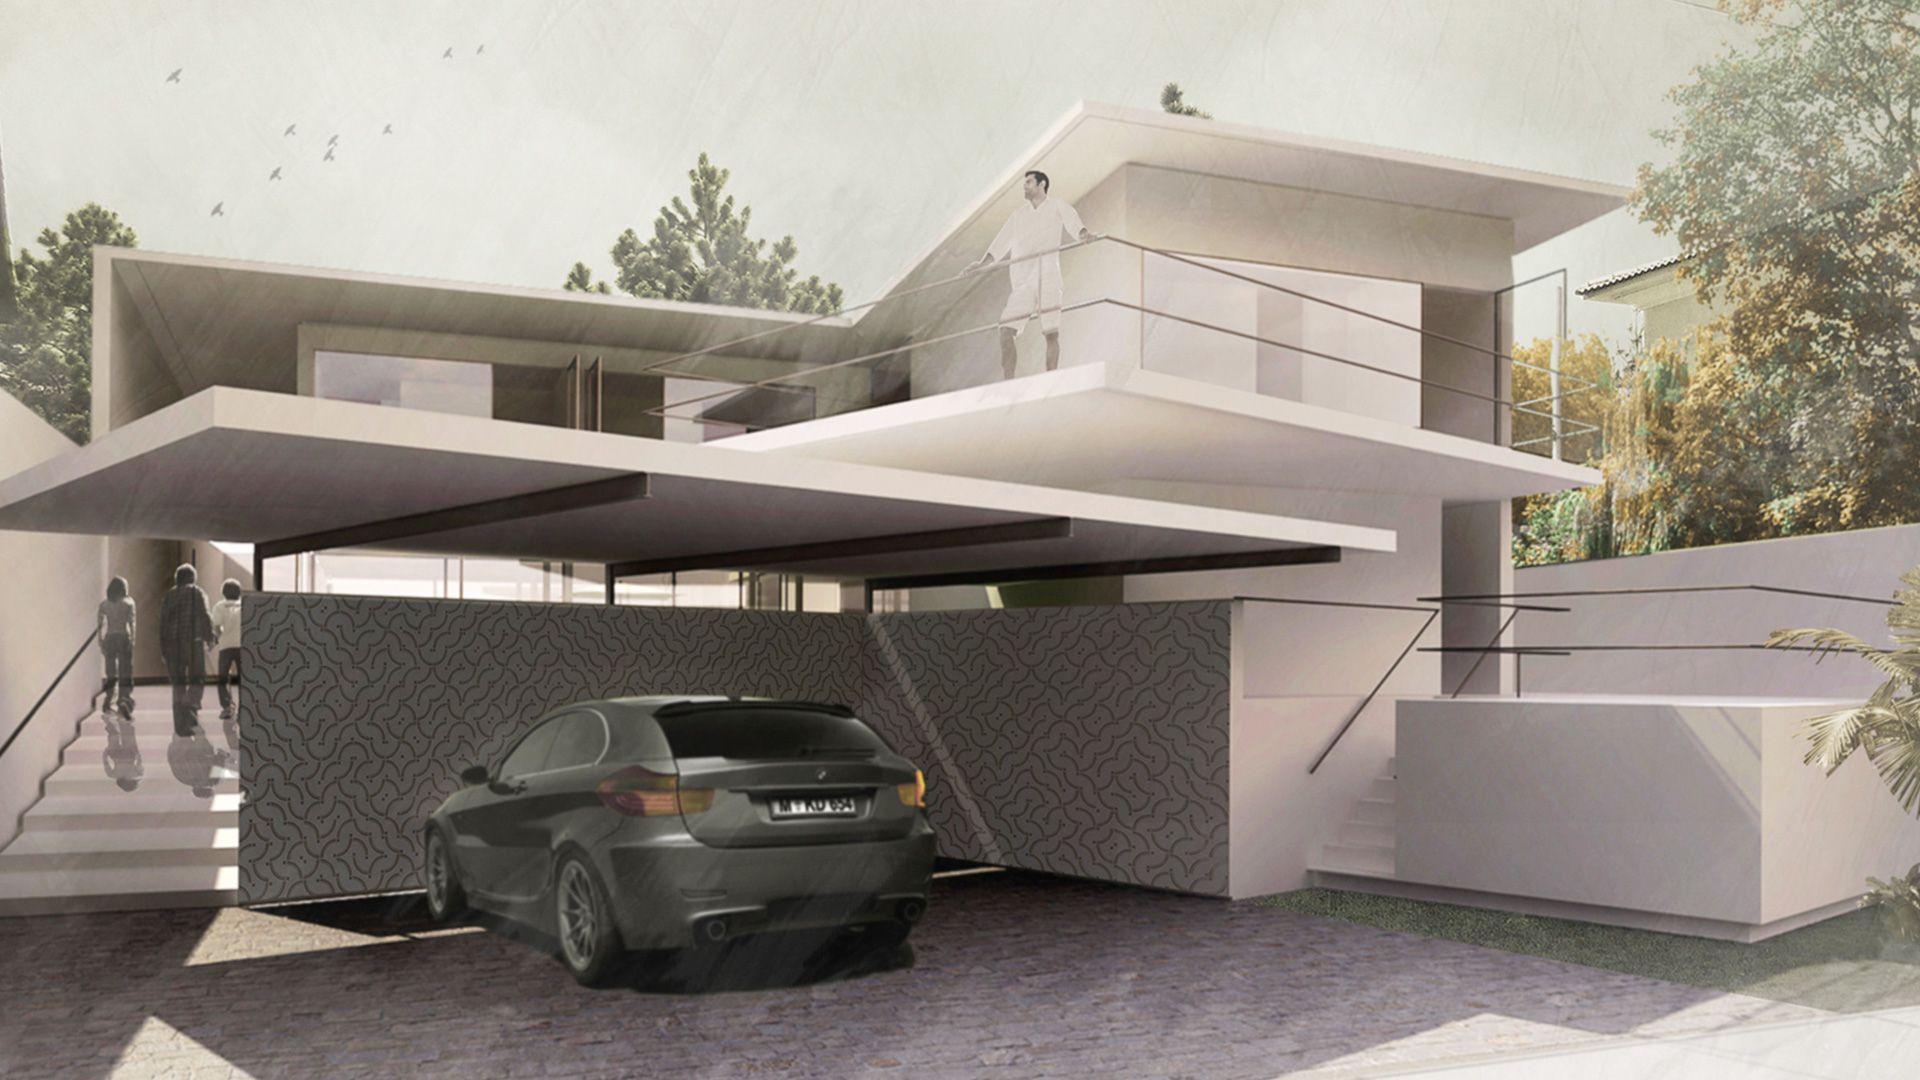 residencia-aldeia-da-serra-render-externo-01